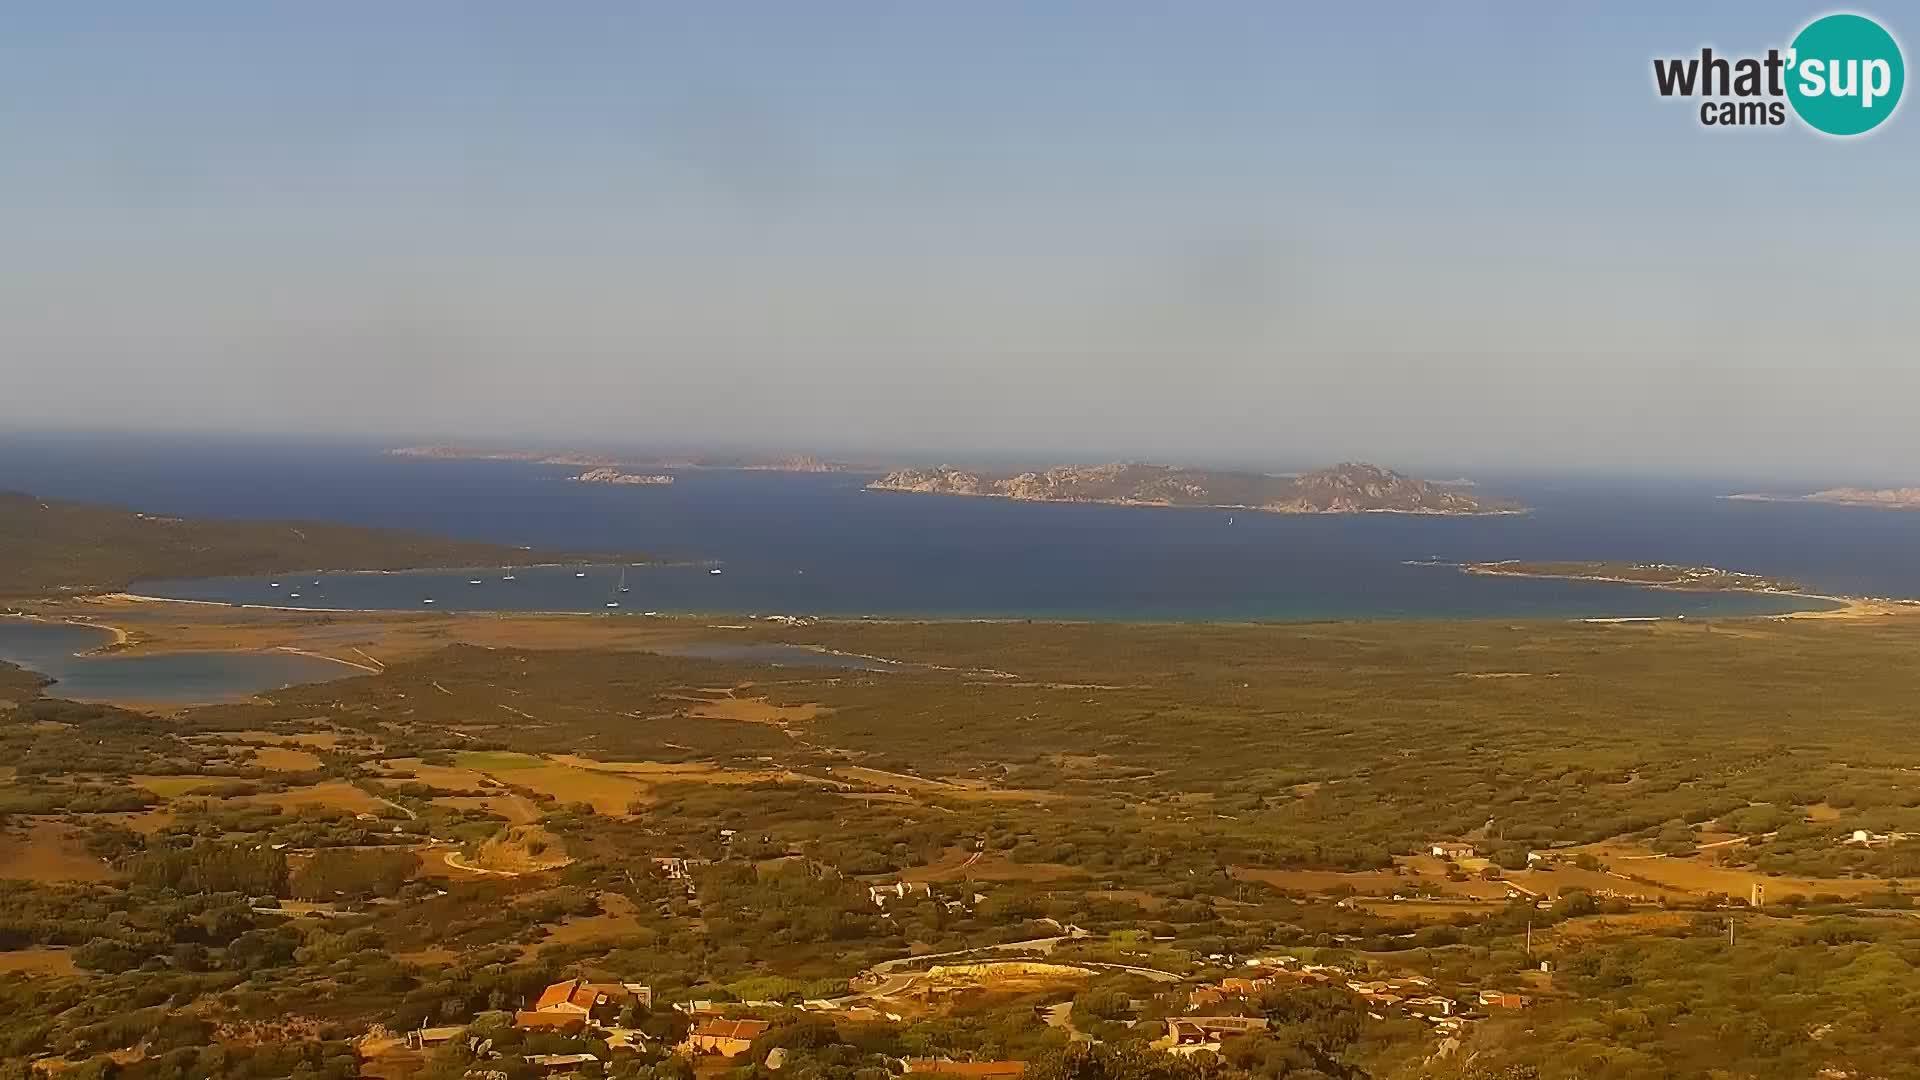 Webcam San Pasquale – Santa Teresa Gallura – Sardegna Livecam